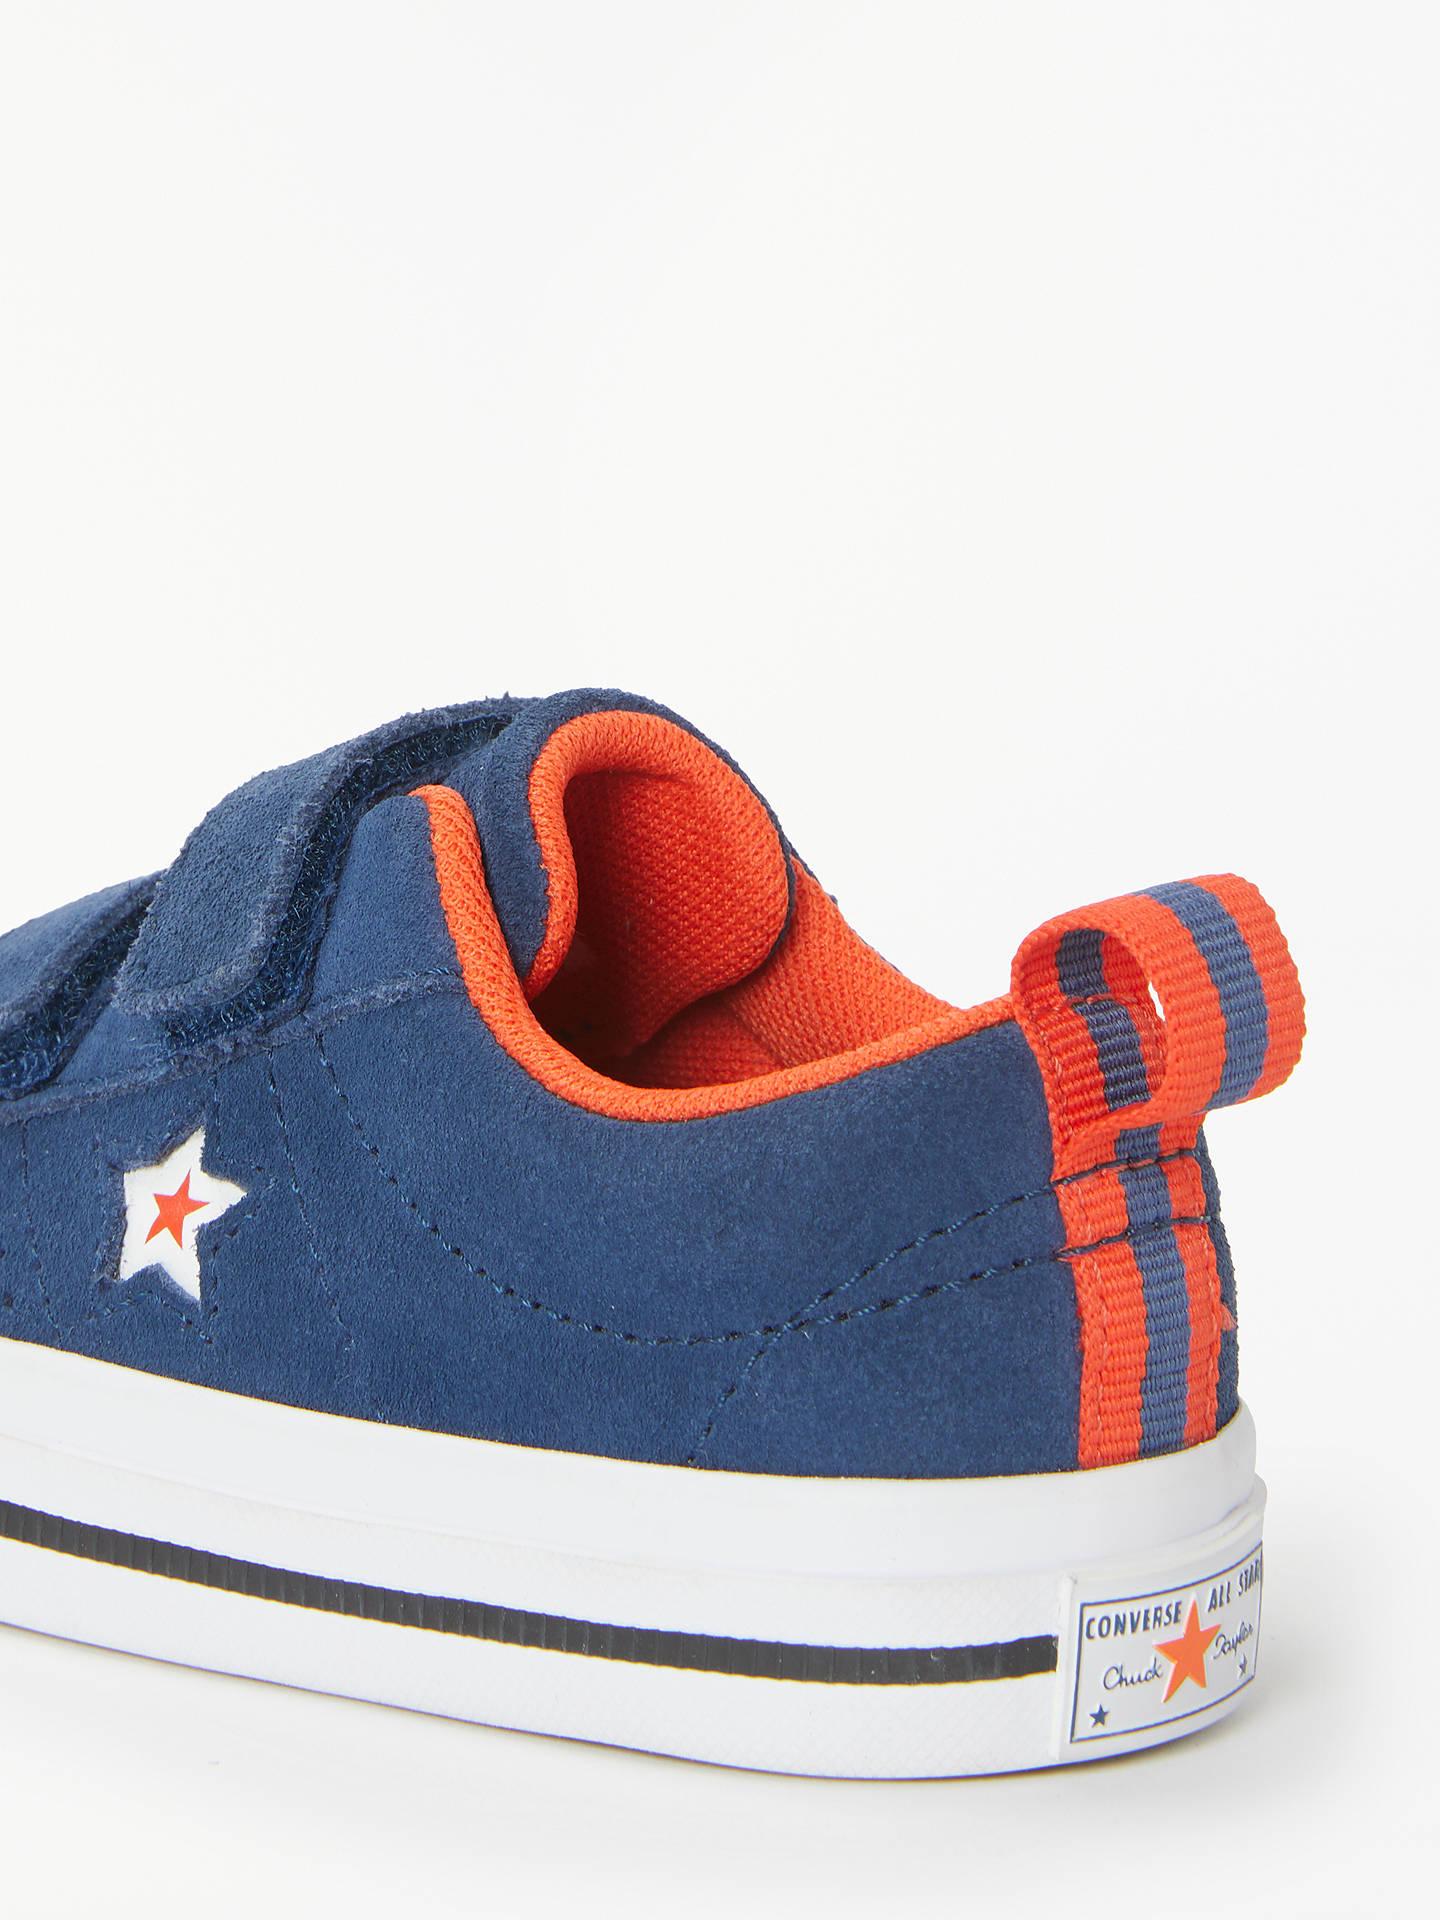 5c9dafd600eb ... Buy Converse Children s One Star Trainers